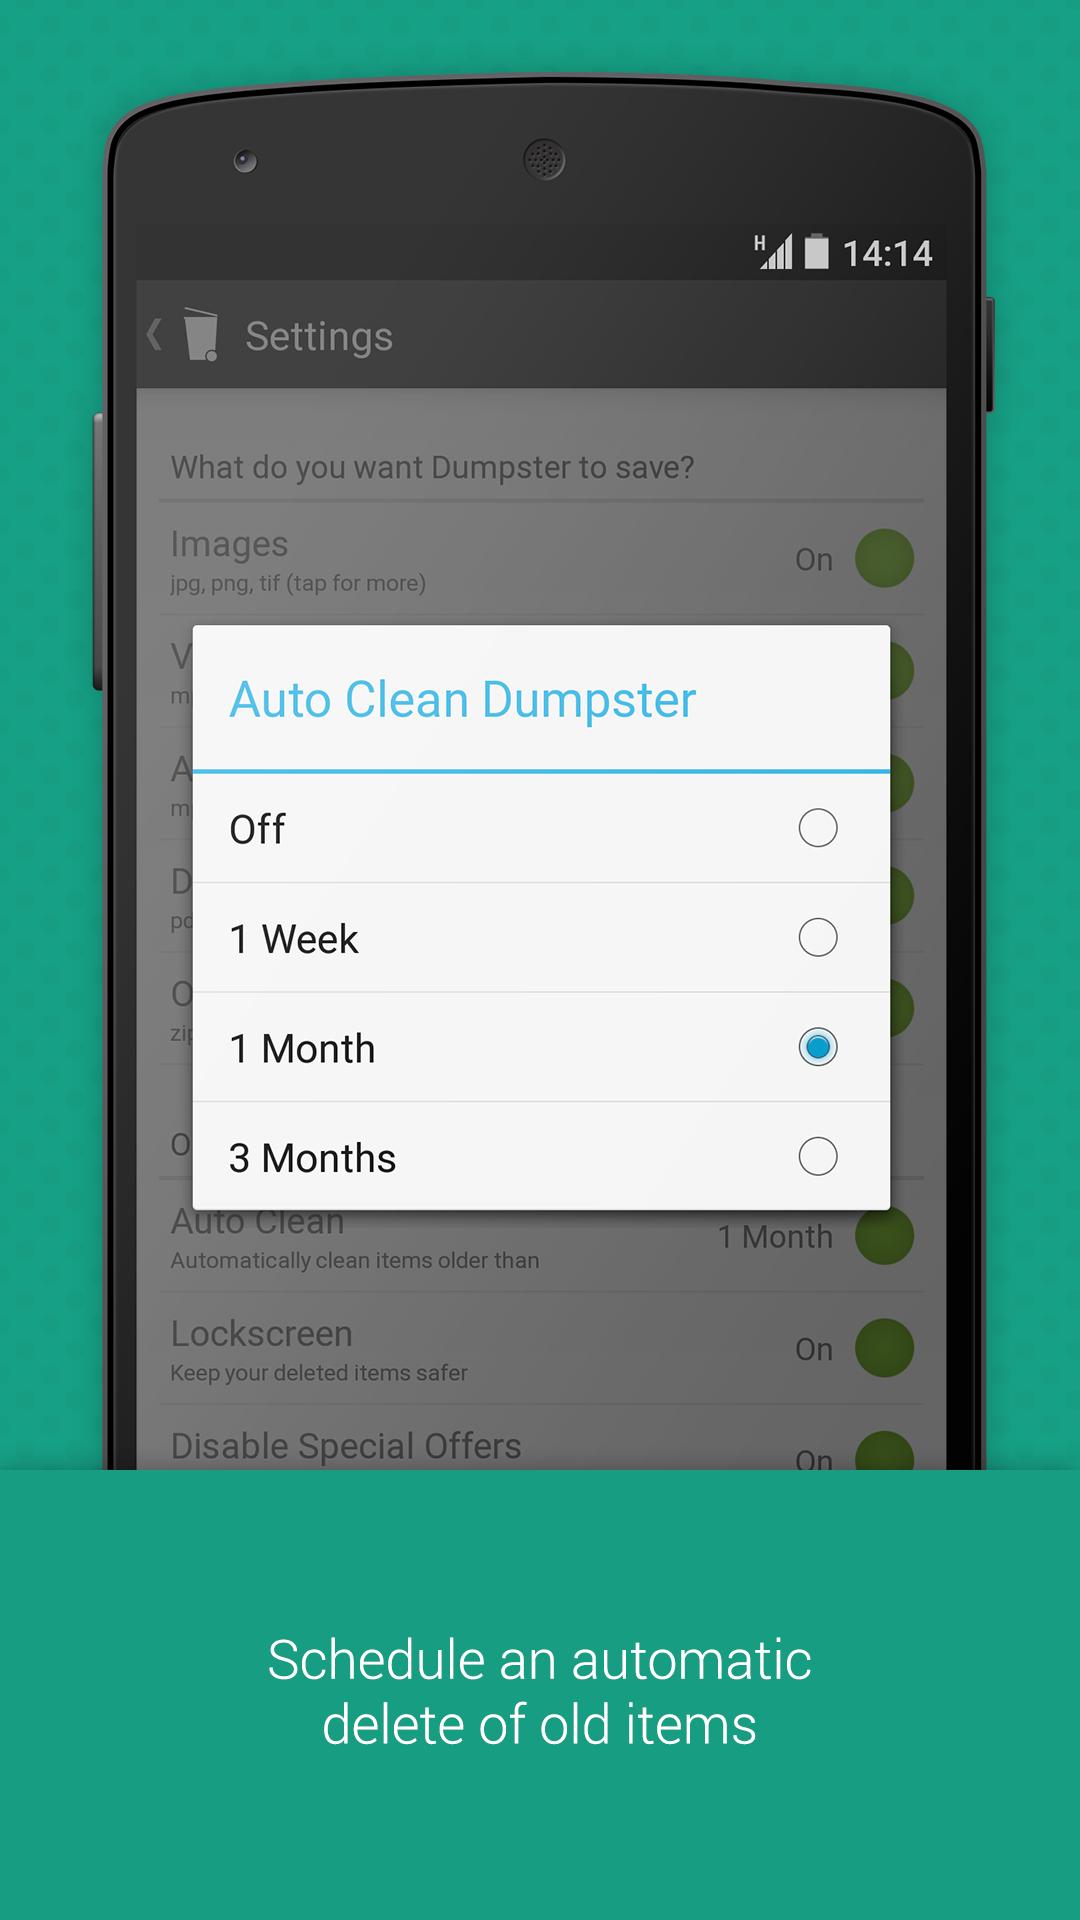 Dumpster Photo & Video Restore screenshot #5